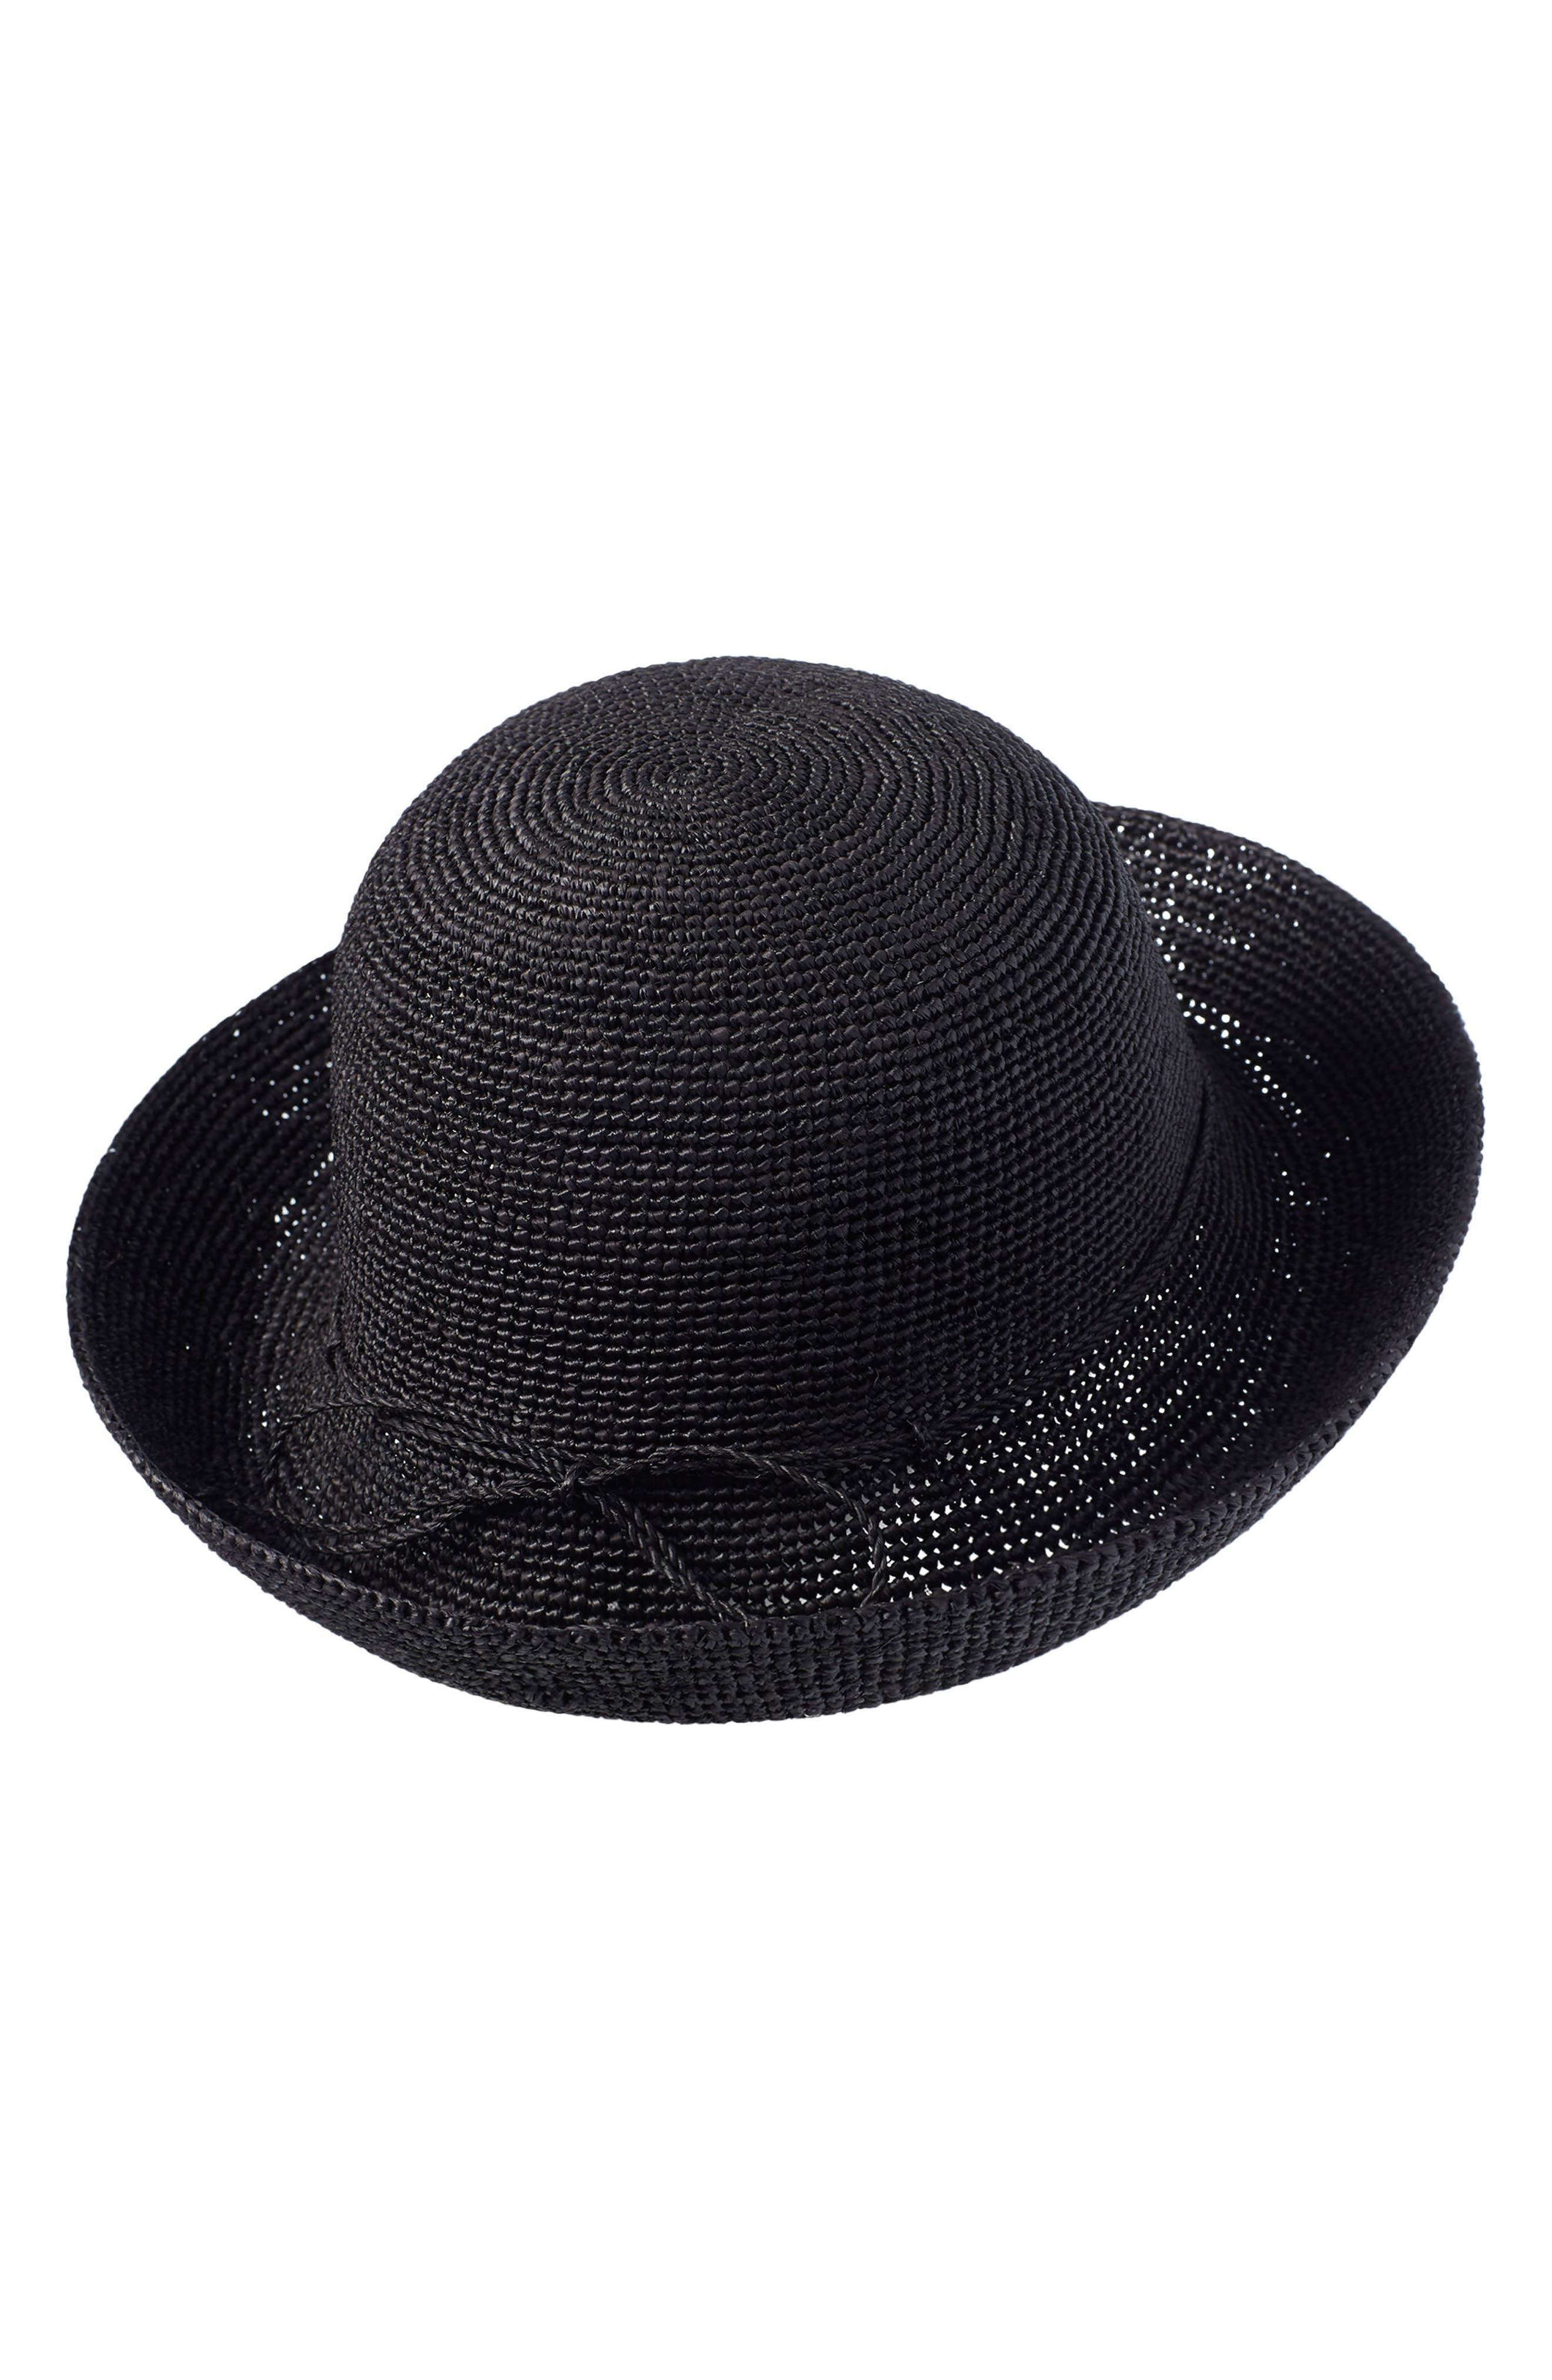 Classic Upturn Crocheted Raffia Hat,                         Main,                         color, 001